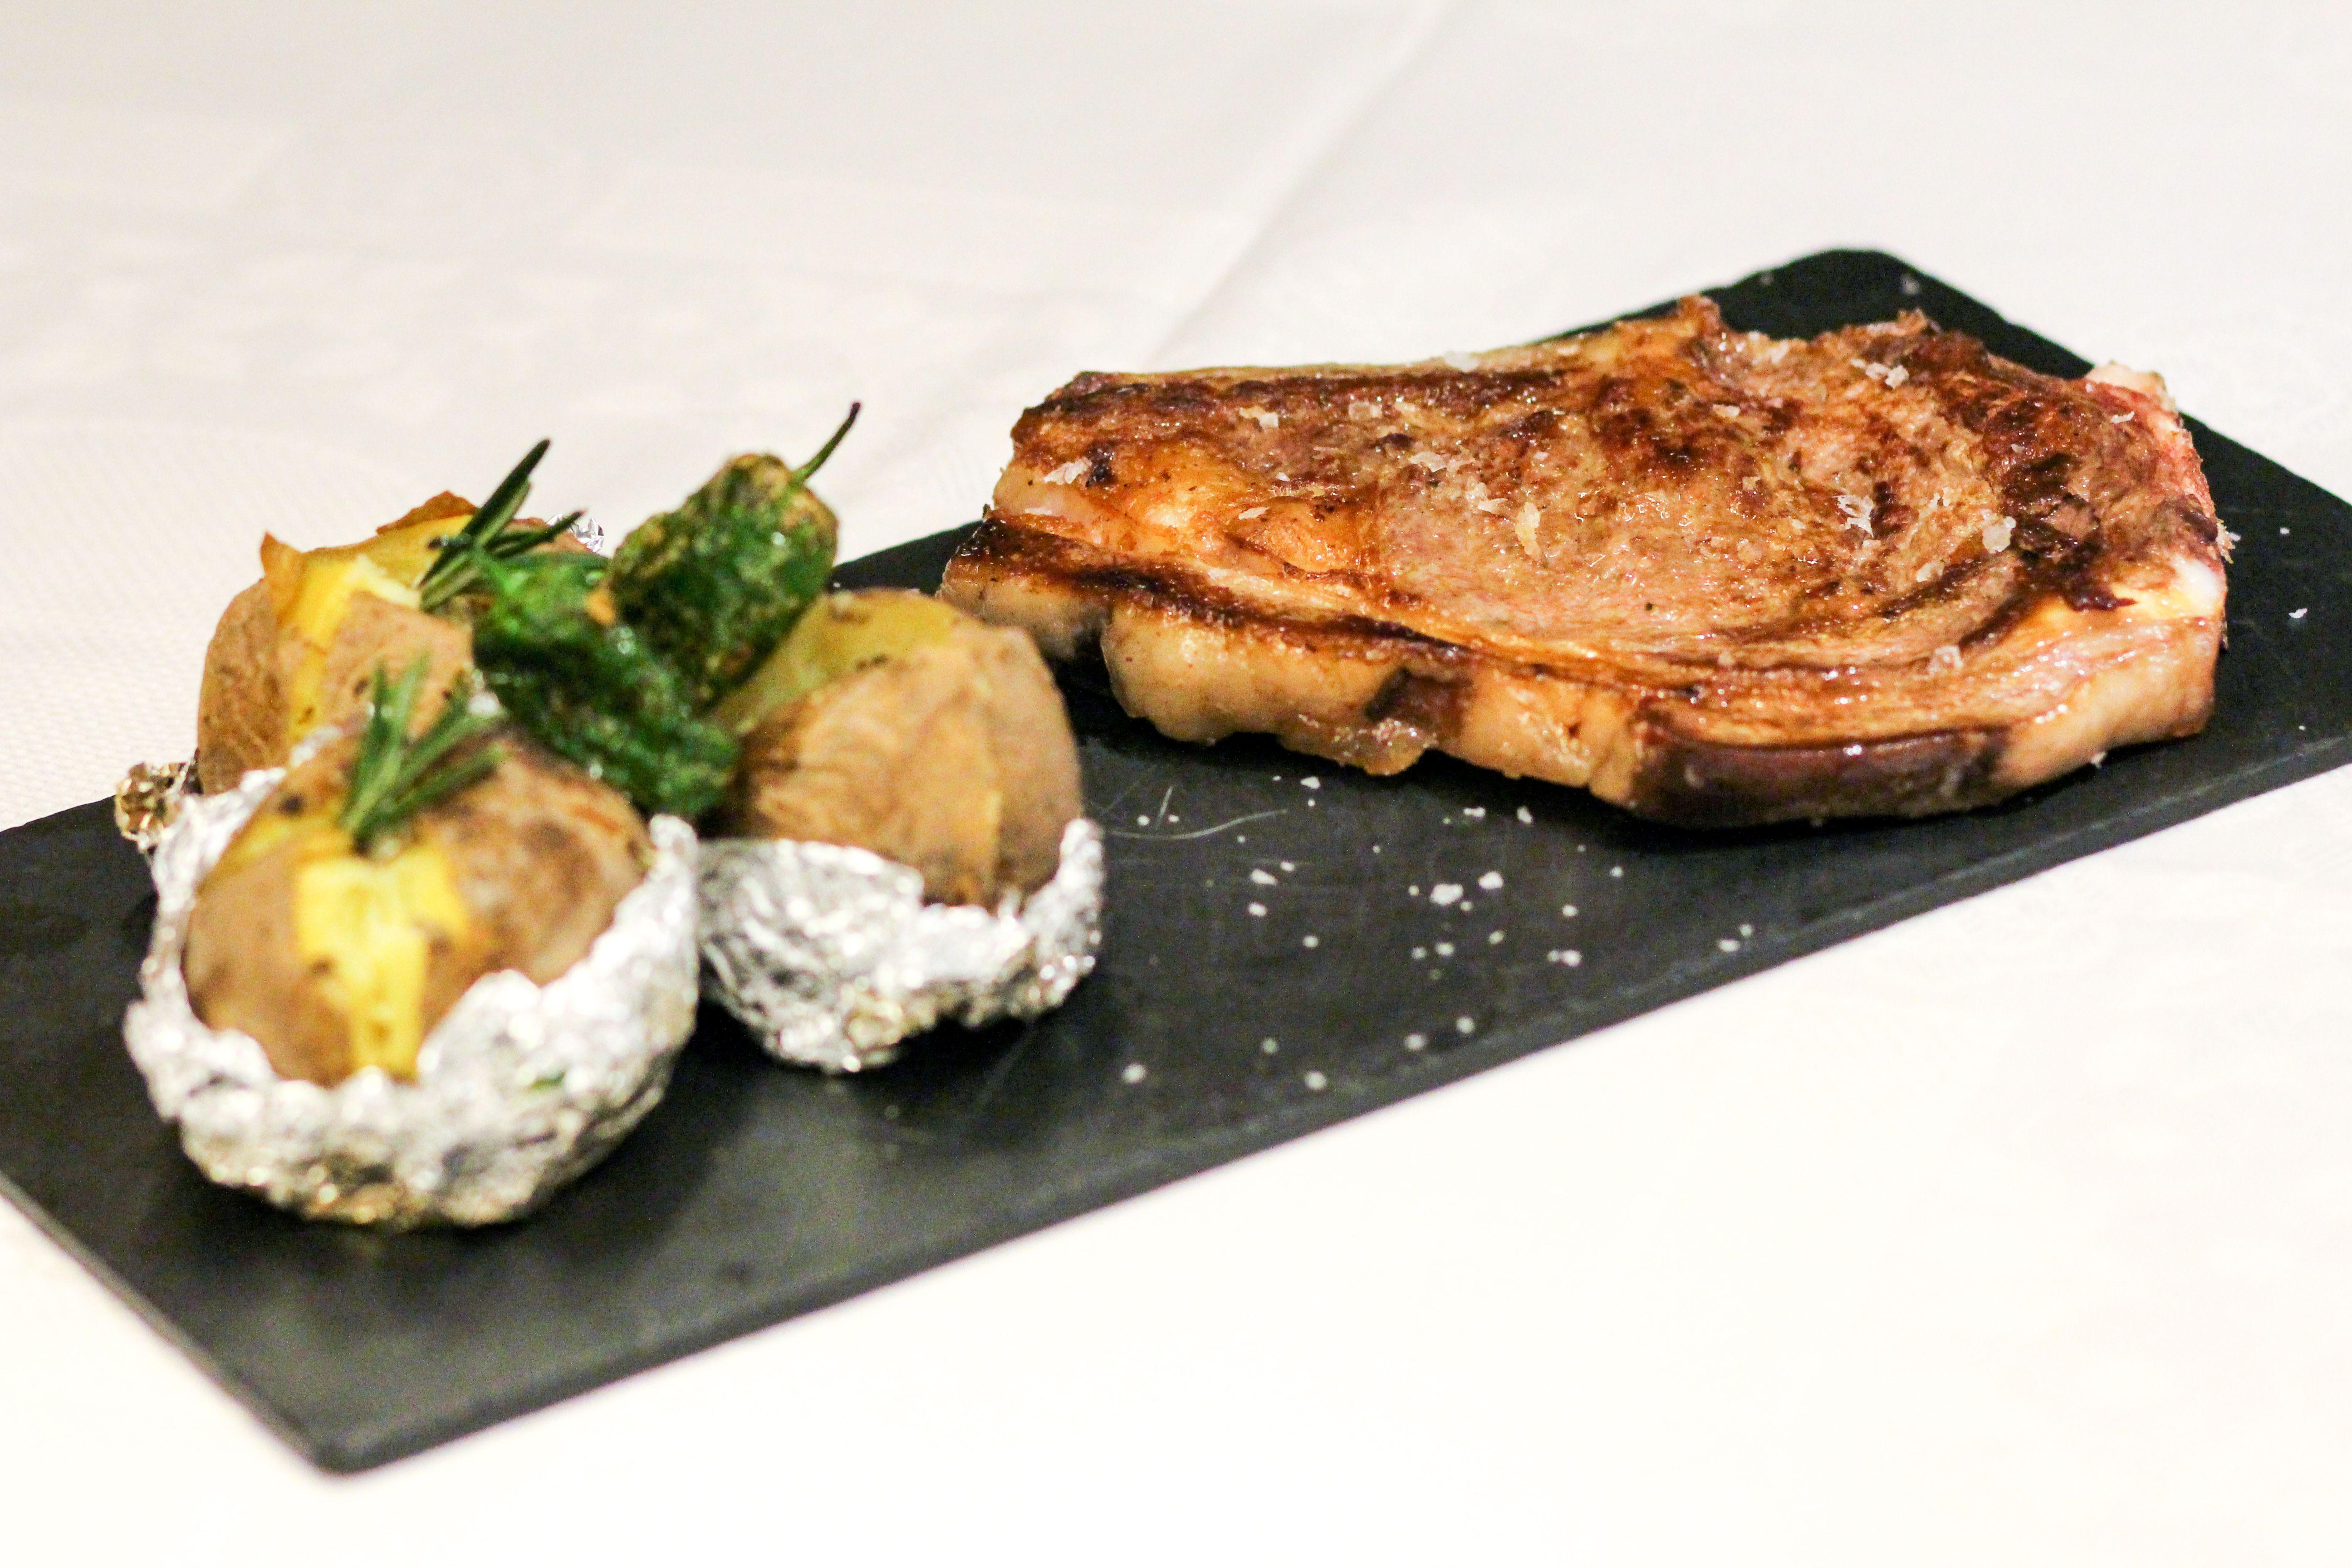 Taberna andaluza en Madrid centro, con deliciosos platos